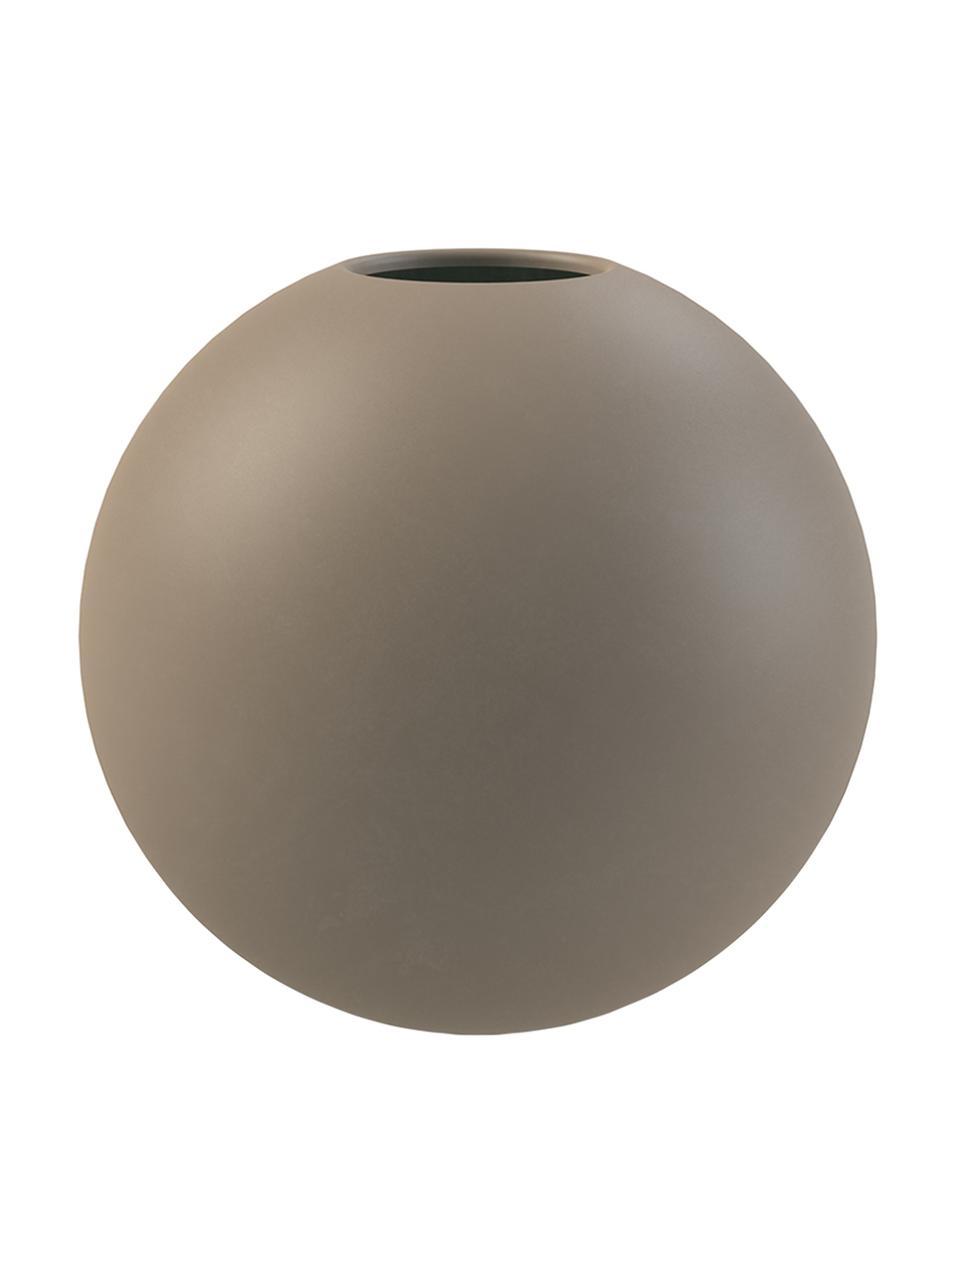 Handgefertigte Kugel-Vase Ball, Keramik, Taupe, Ø 10 x H 10 cm